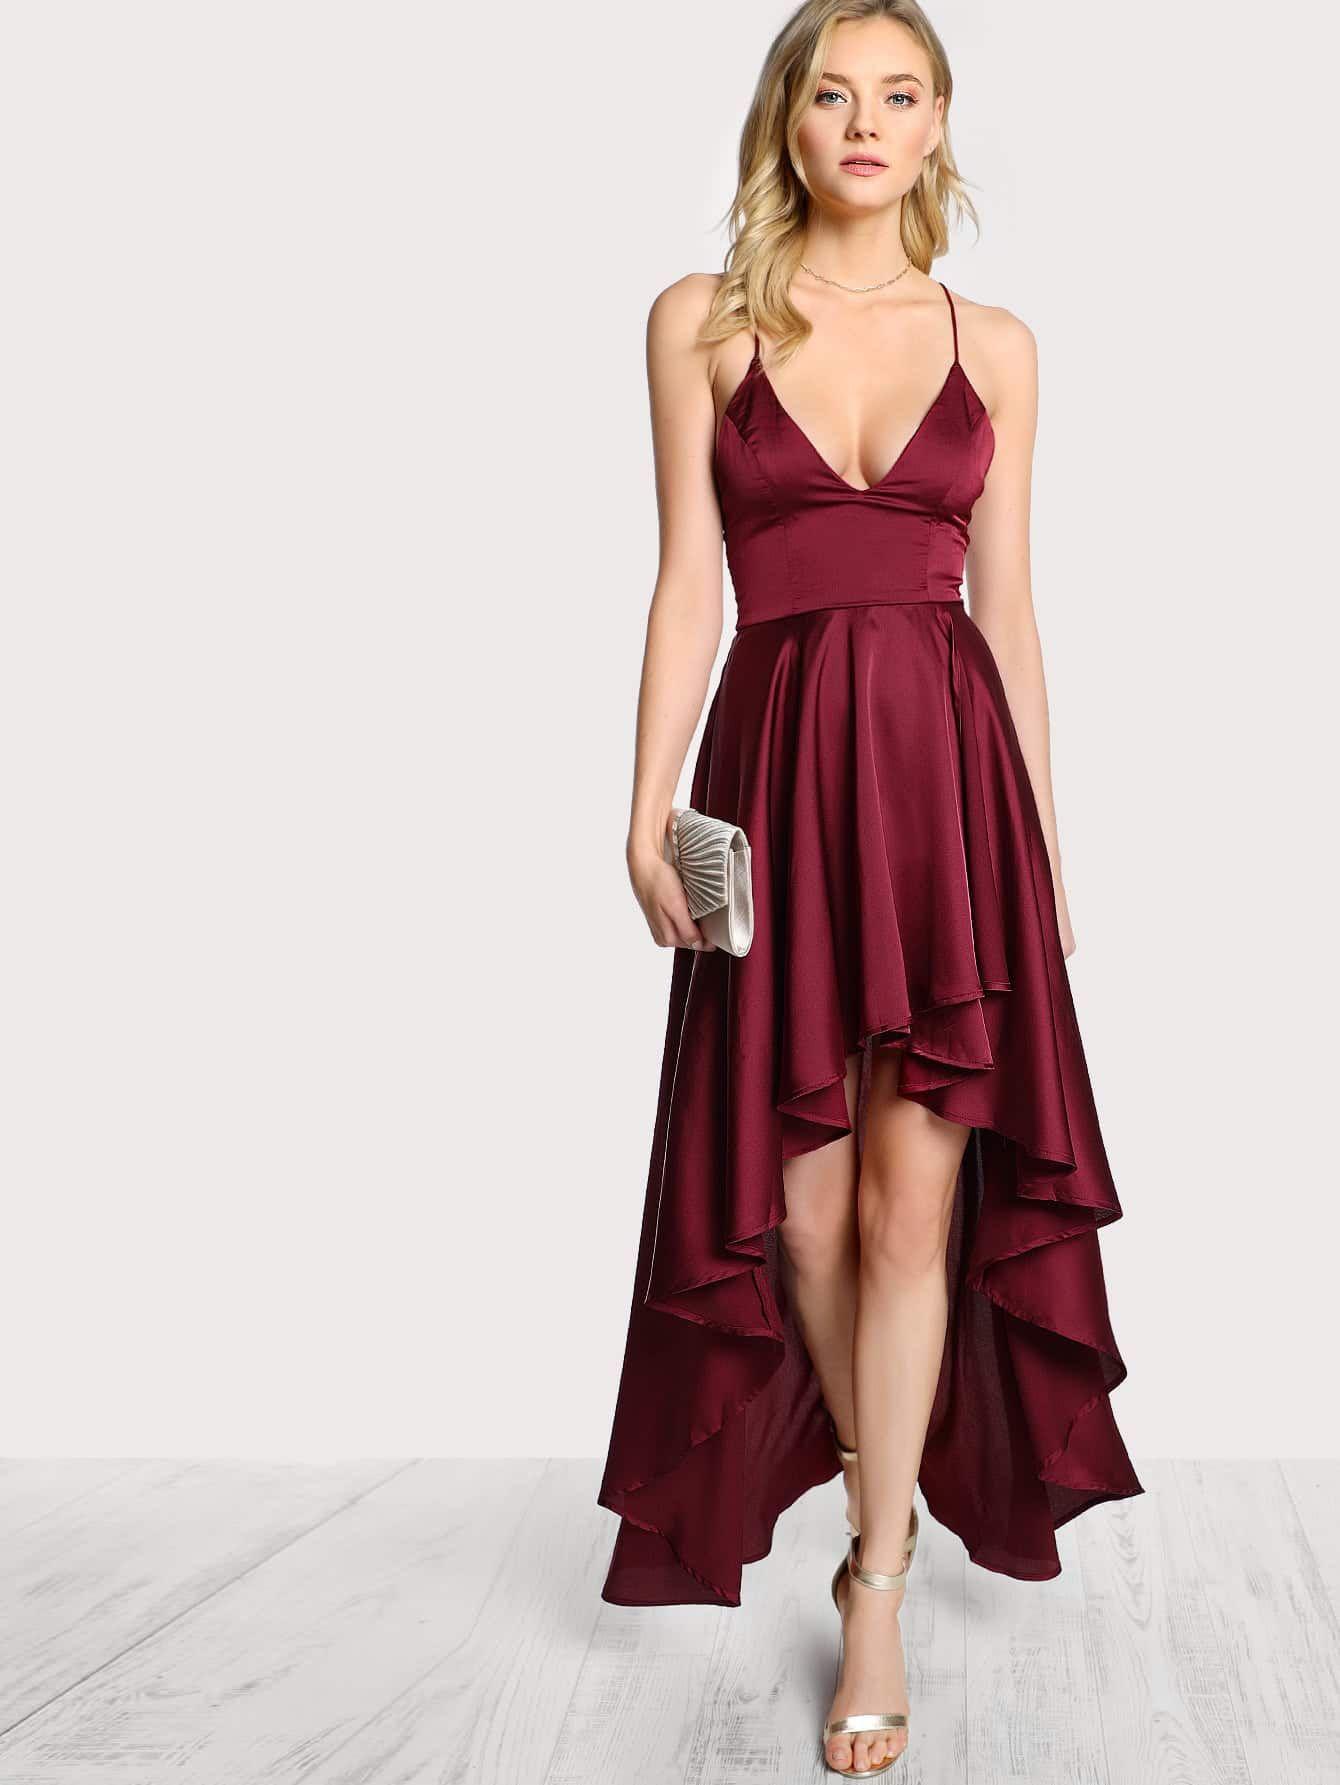 Crisscross back plunging high low cami dress stylish